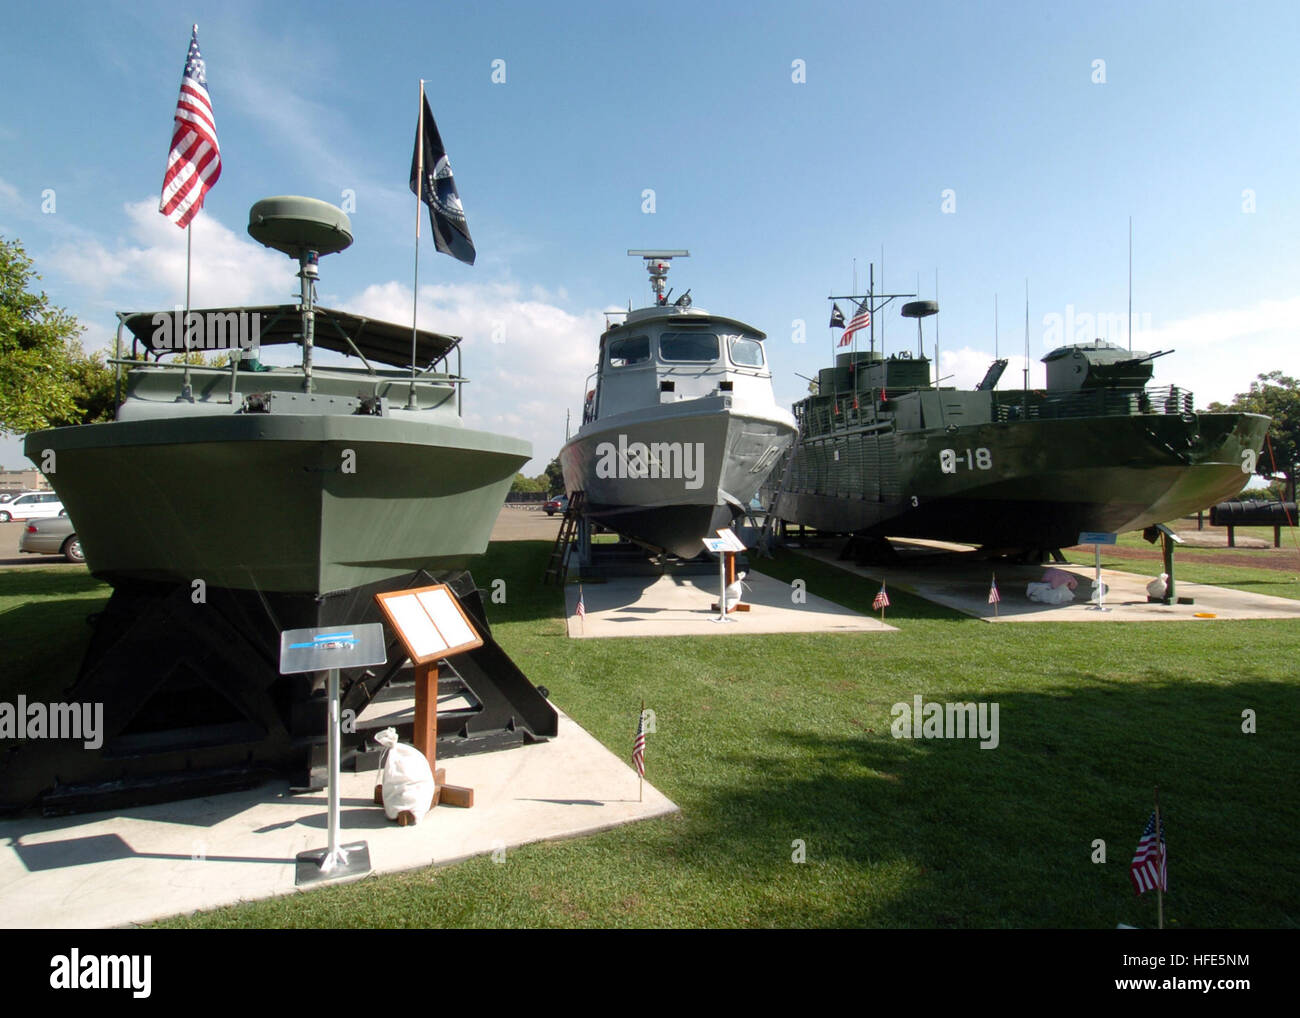 041111-N-7949W-007 Naval Amphibious Base Coronado, Calif. (Nov. 11, 2004) - Visitors to the Vietnam Unit Memorial - Stock Image